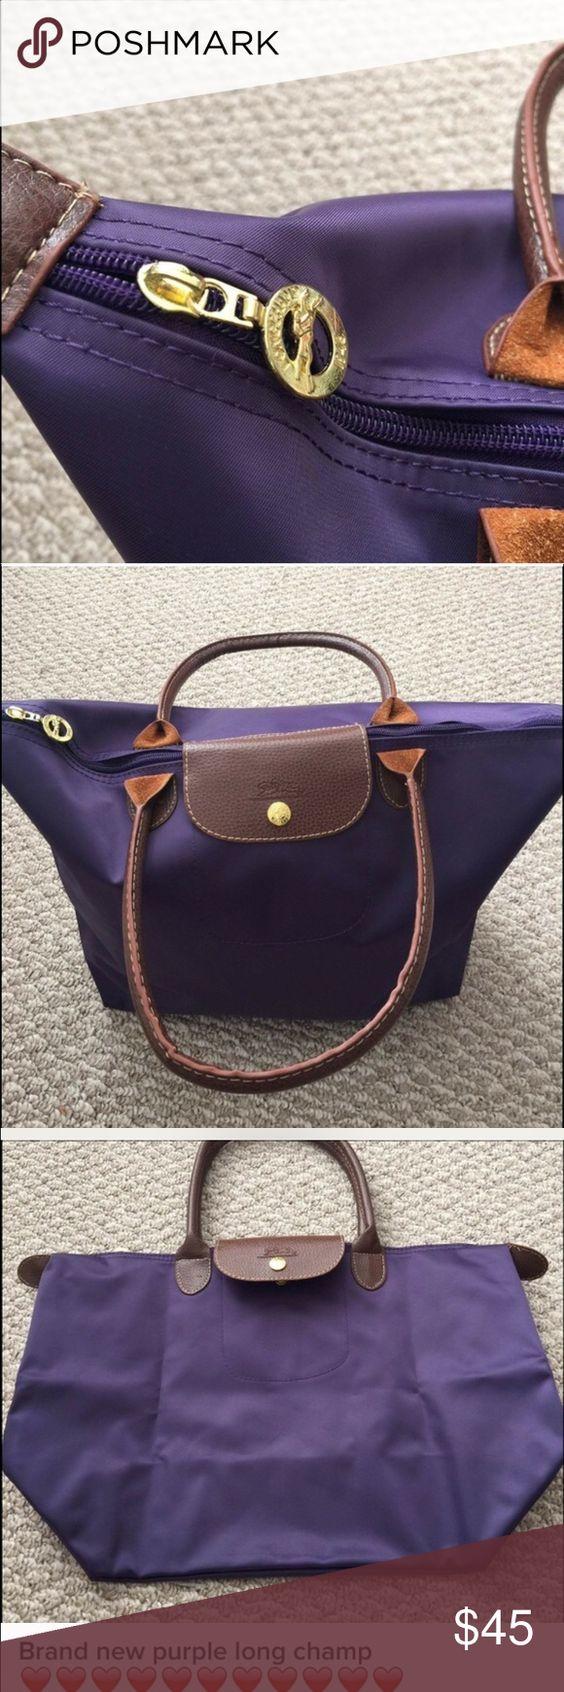 Beautiful long champ bag ❤️❤️❤️❤️❤️❤️❤️❤️ New. Longchamp Bags Totes